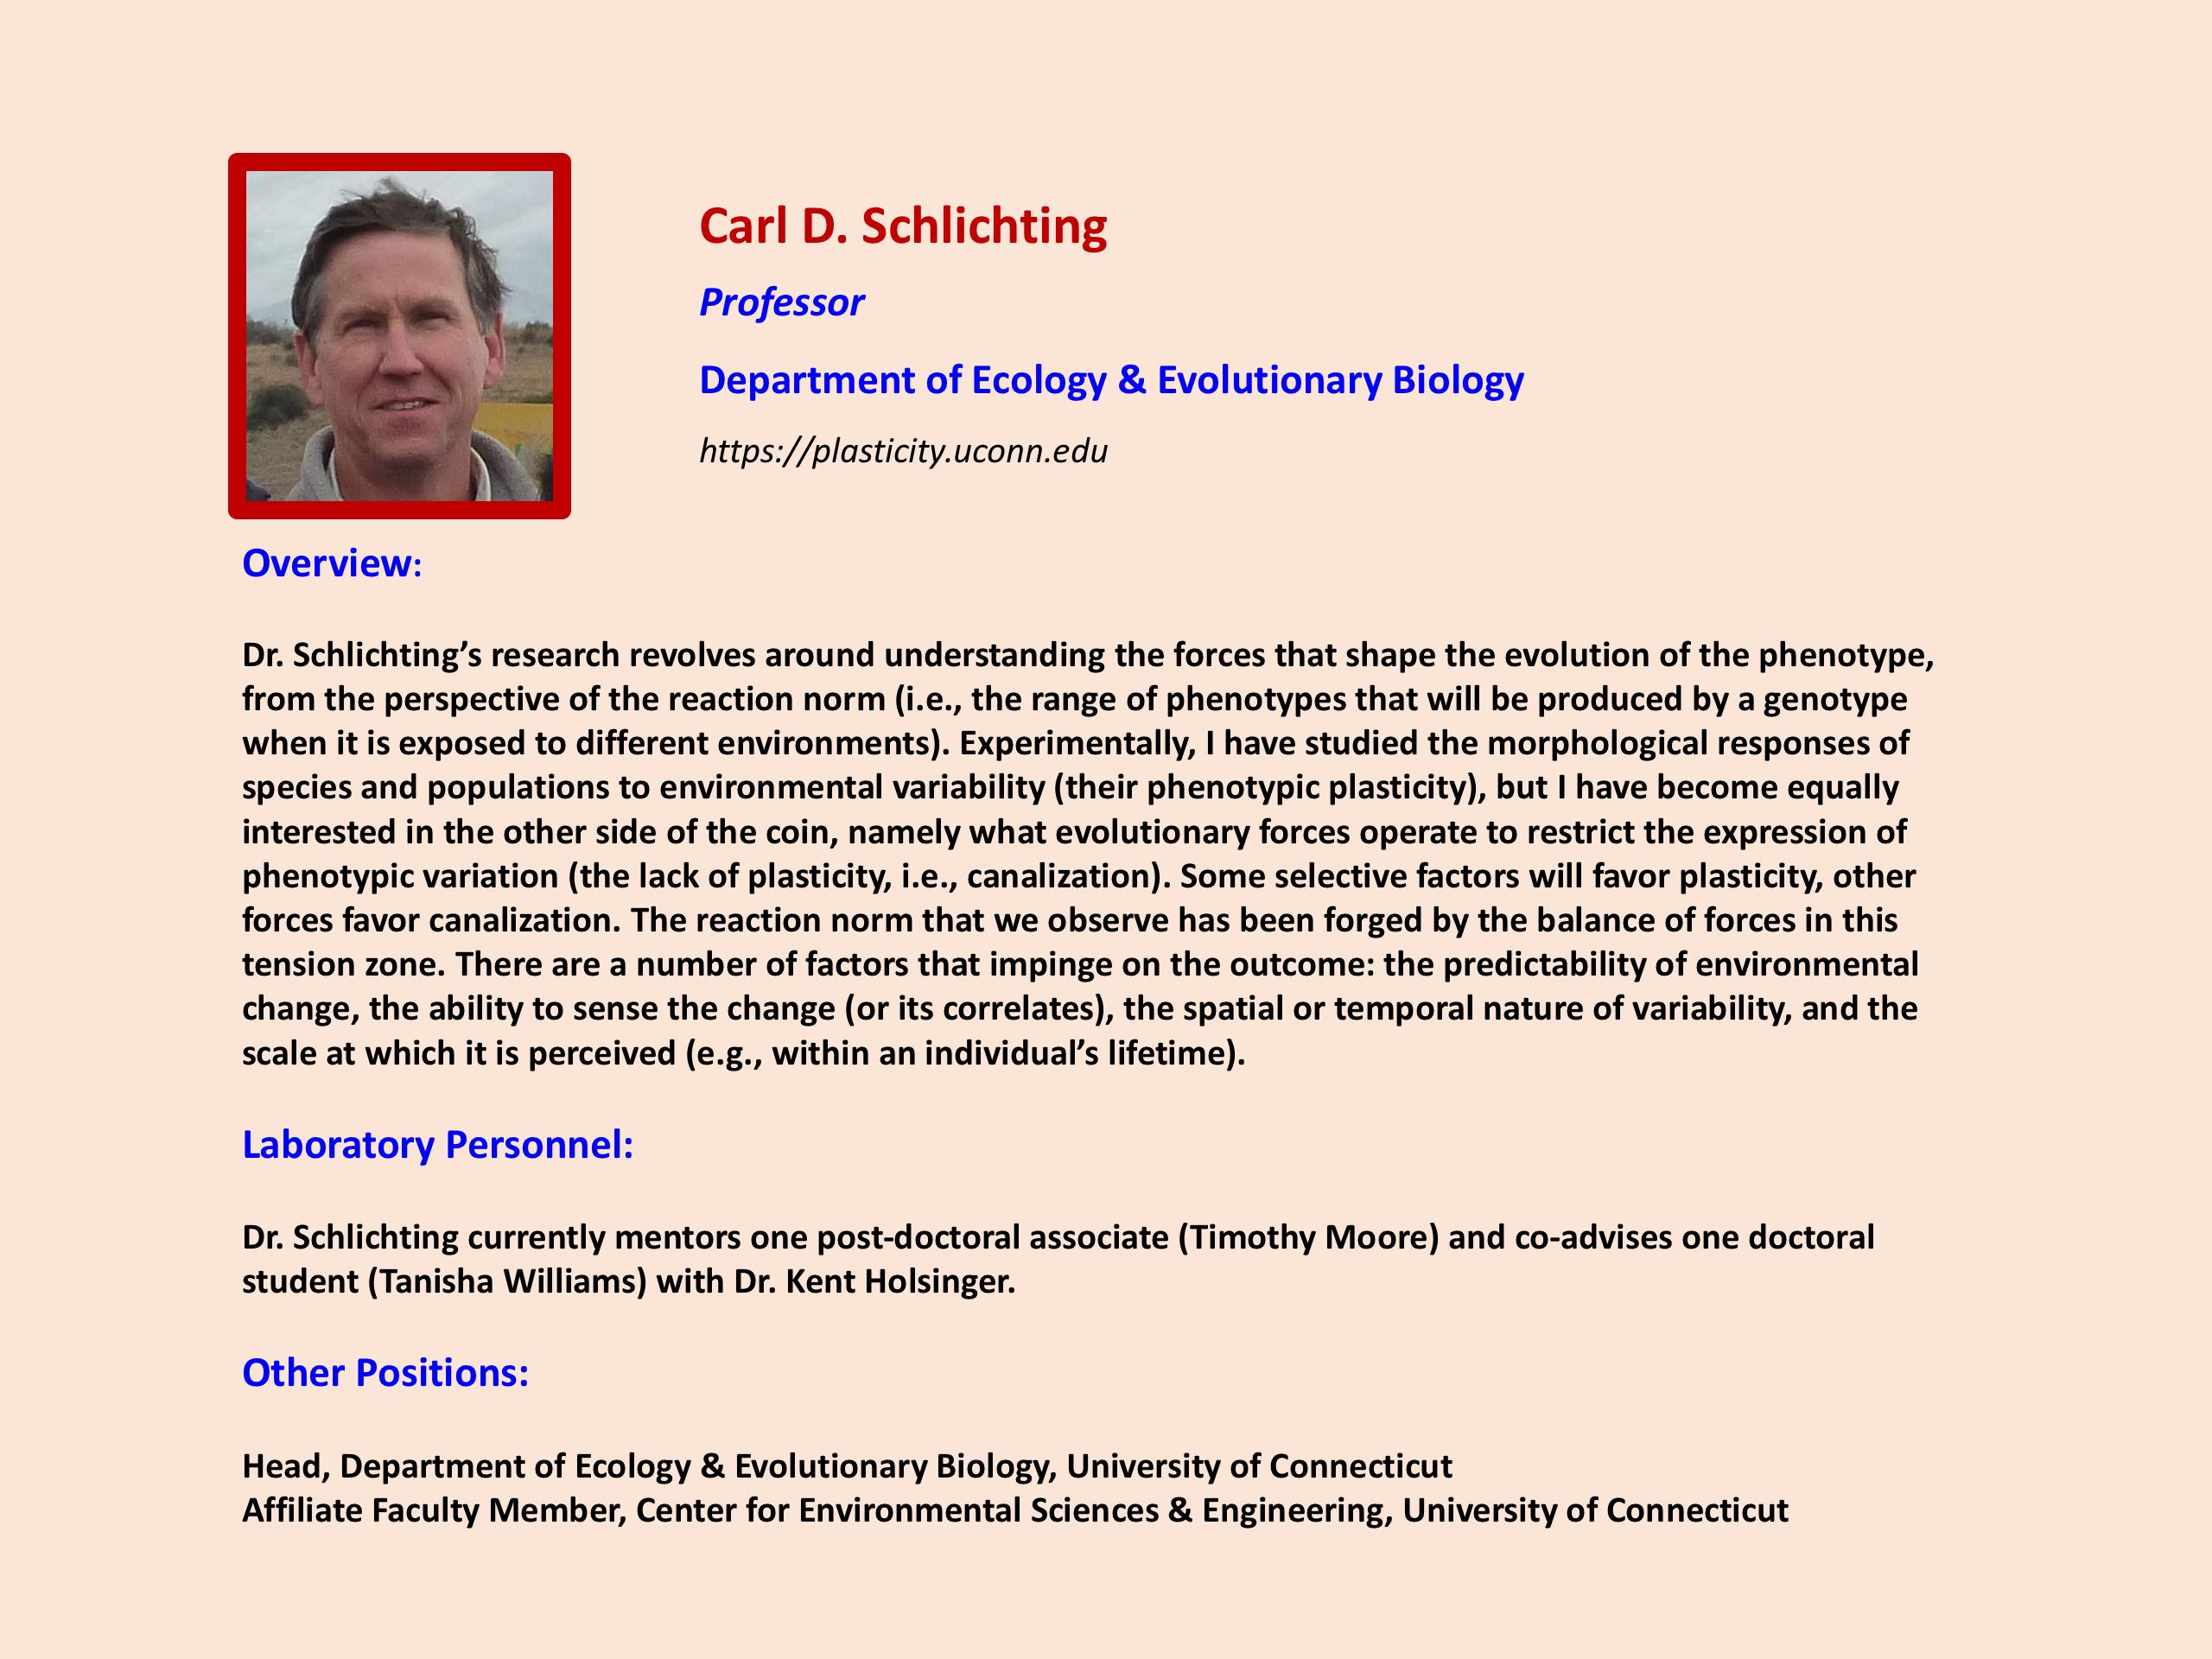 Focus on Faculty Carl Schlichting